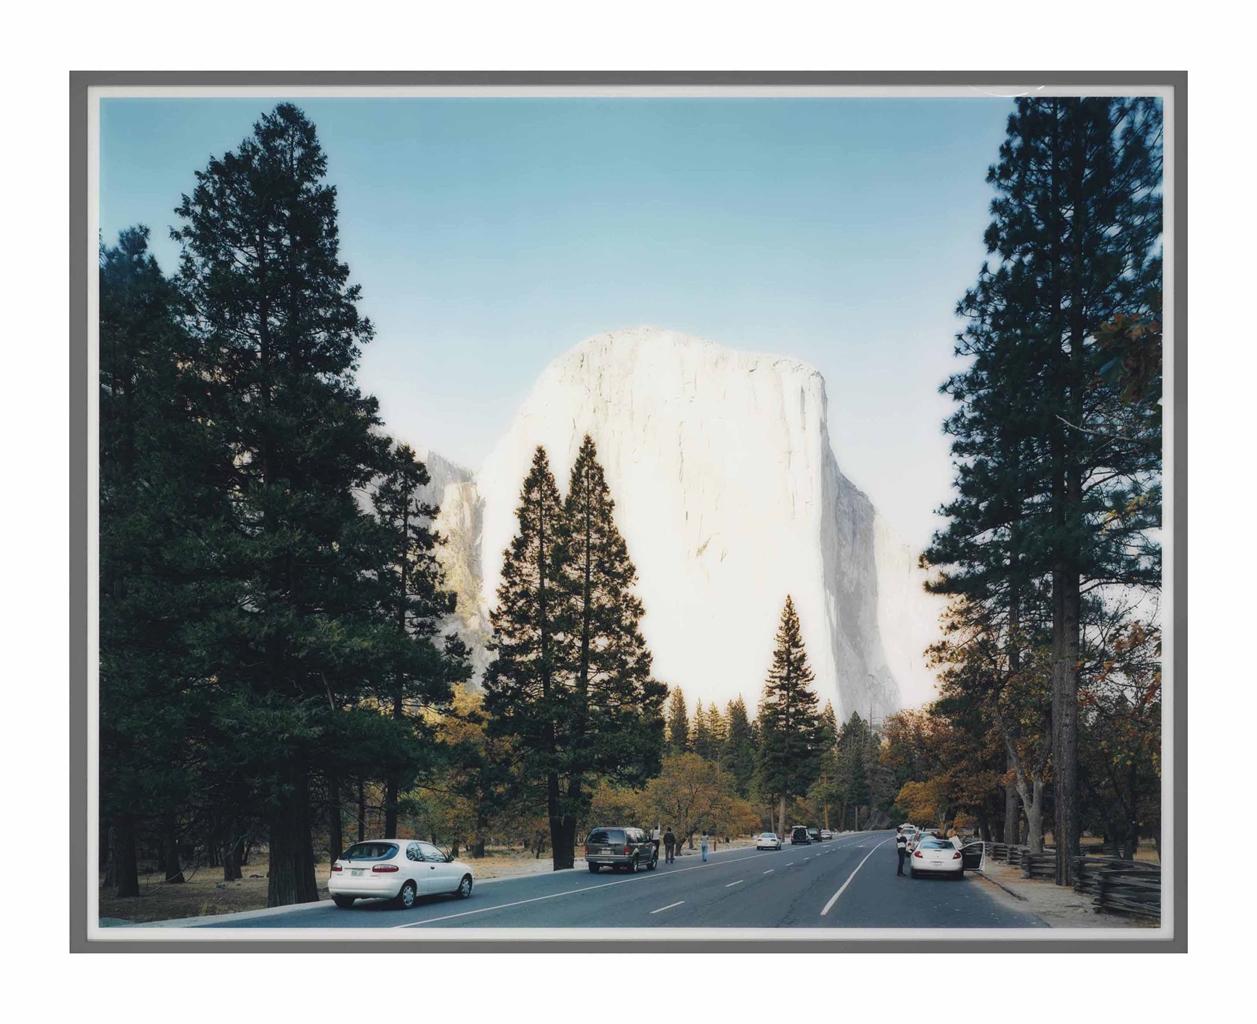 Thomas Struth-El Capitan (Yosemite National Park)-1999